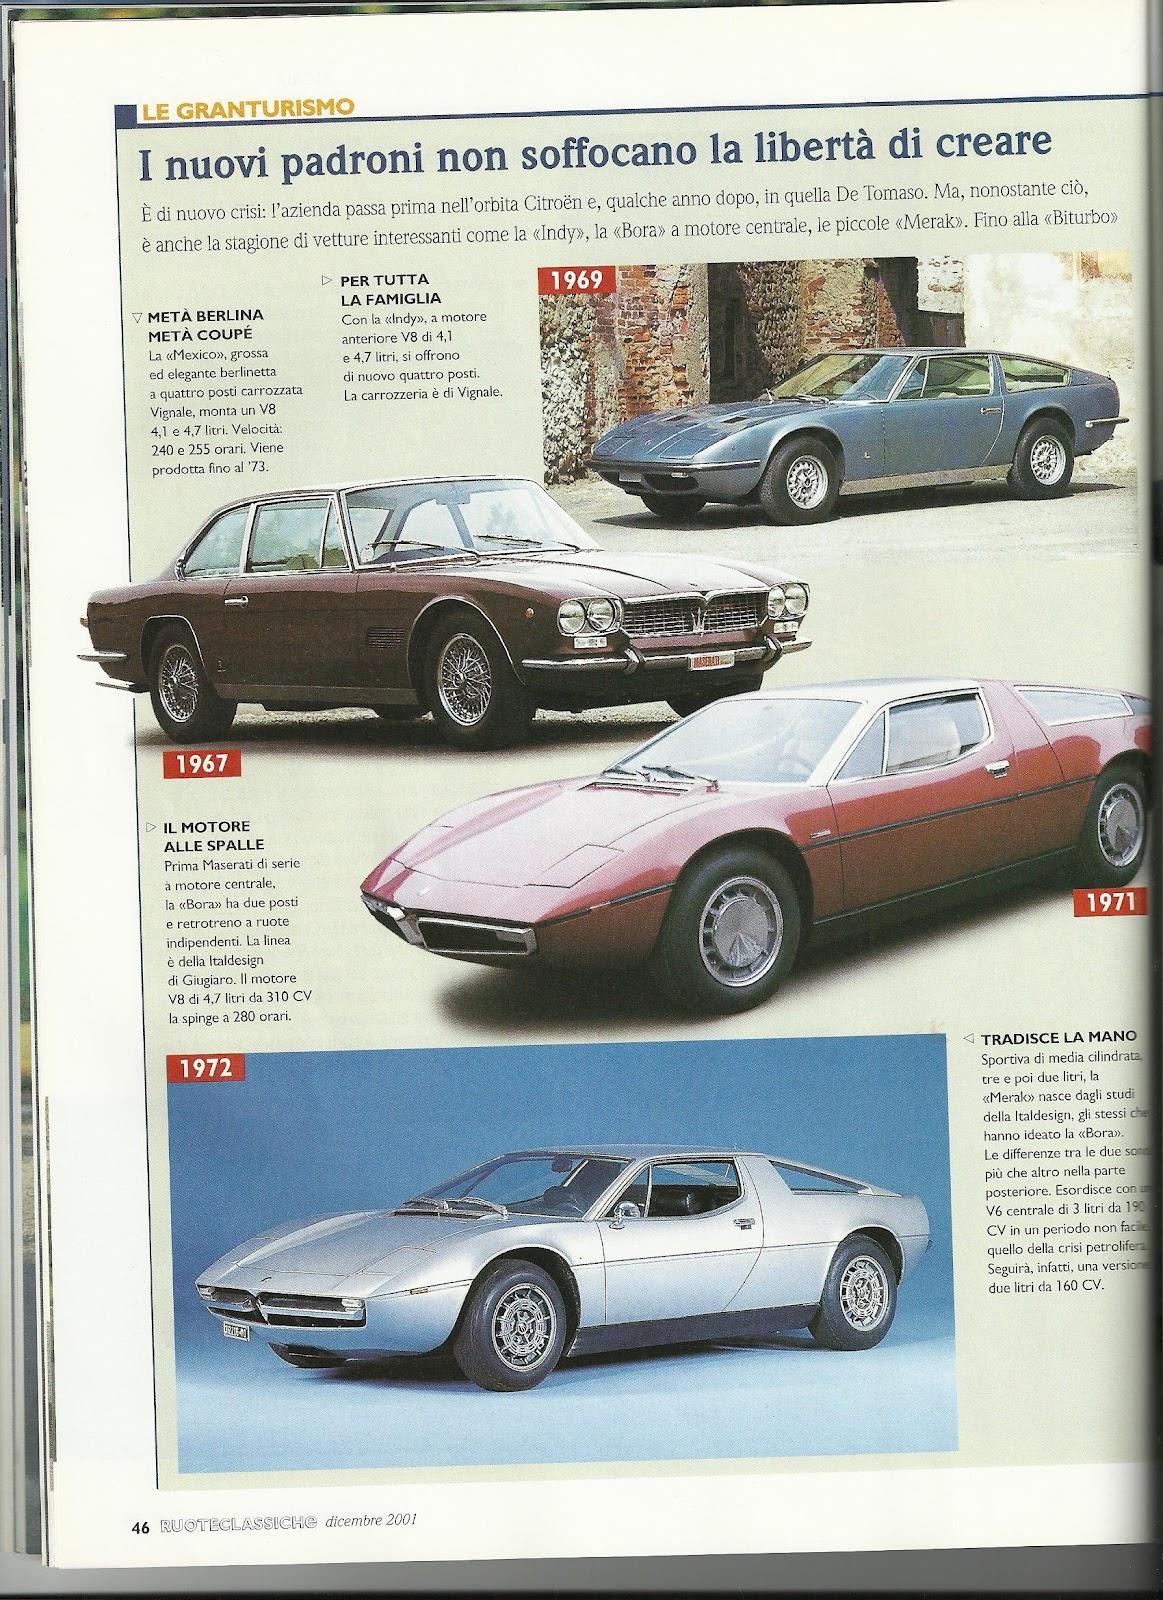 Pubblicato da BCM(Bellina Classic Motors) a 6:02 AM